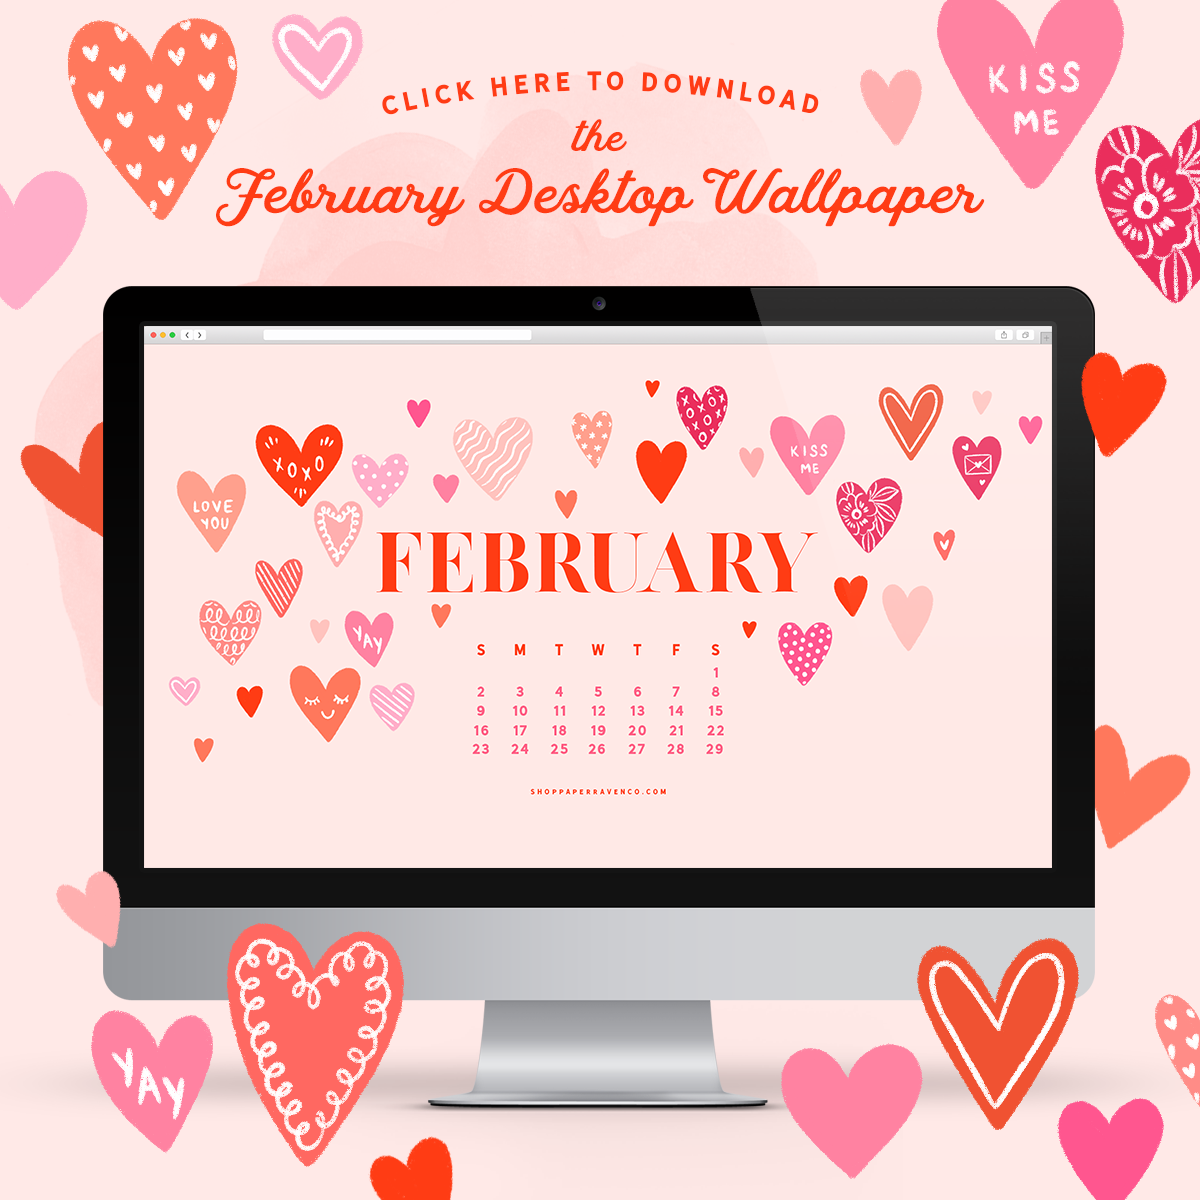 February 2020 Illustrated Desktop Wallpaper by Paper Raven Co. | www.ShopPaperRavenCo.com #desktopwallpaper #dressyourtech #desktopdownload